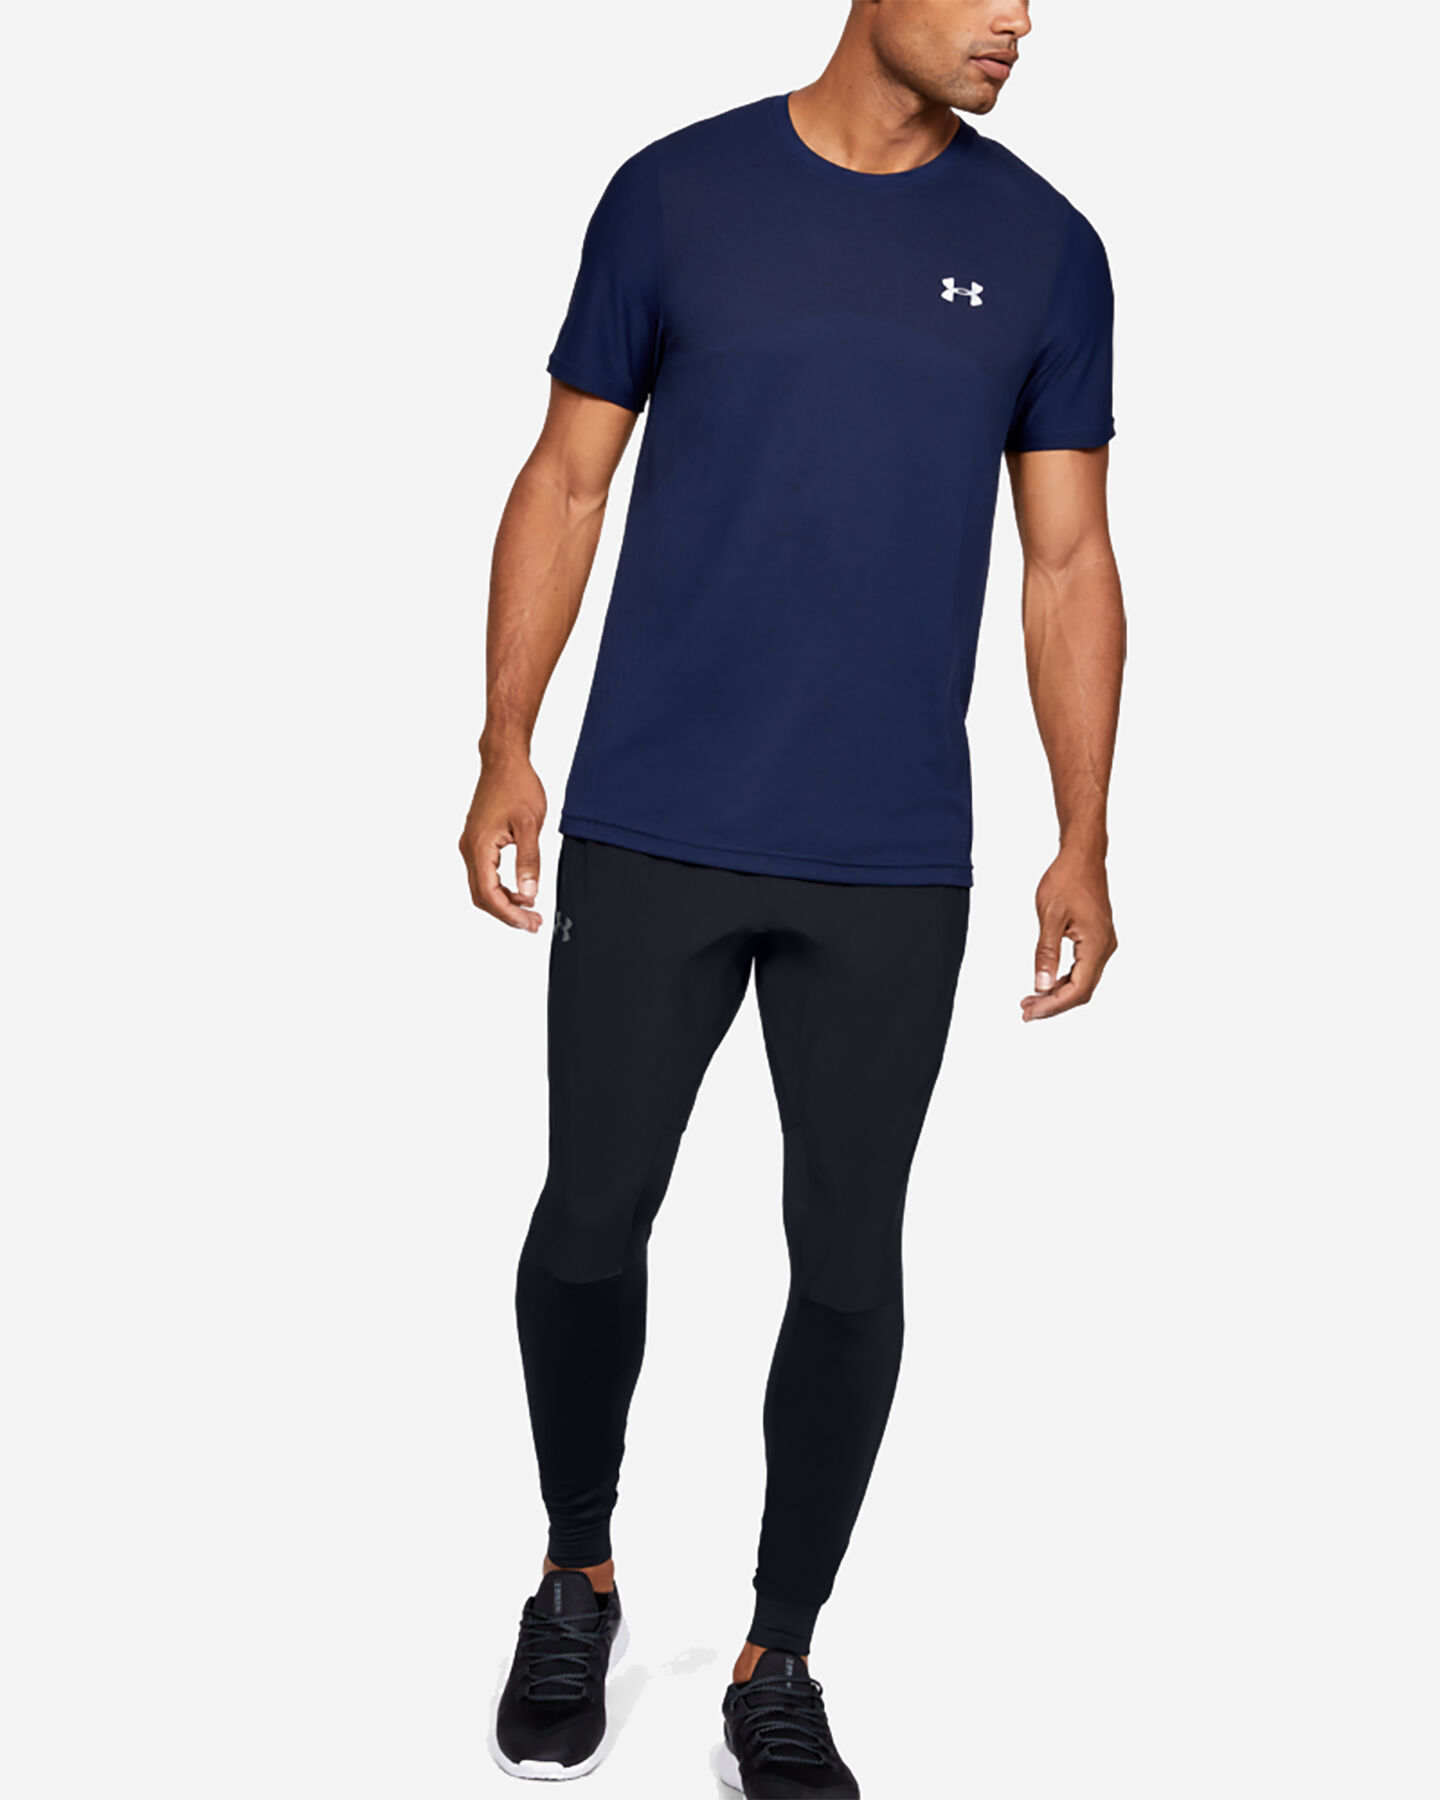 Pantalone training UNDER ARMOUR HYBRID M S5169336 scatto 4